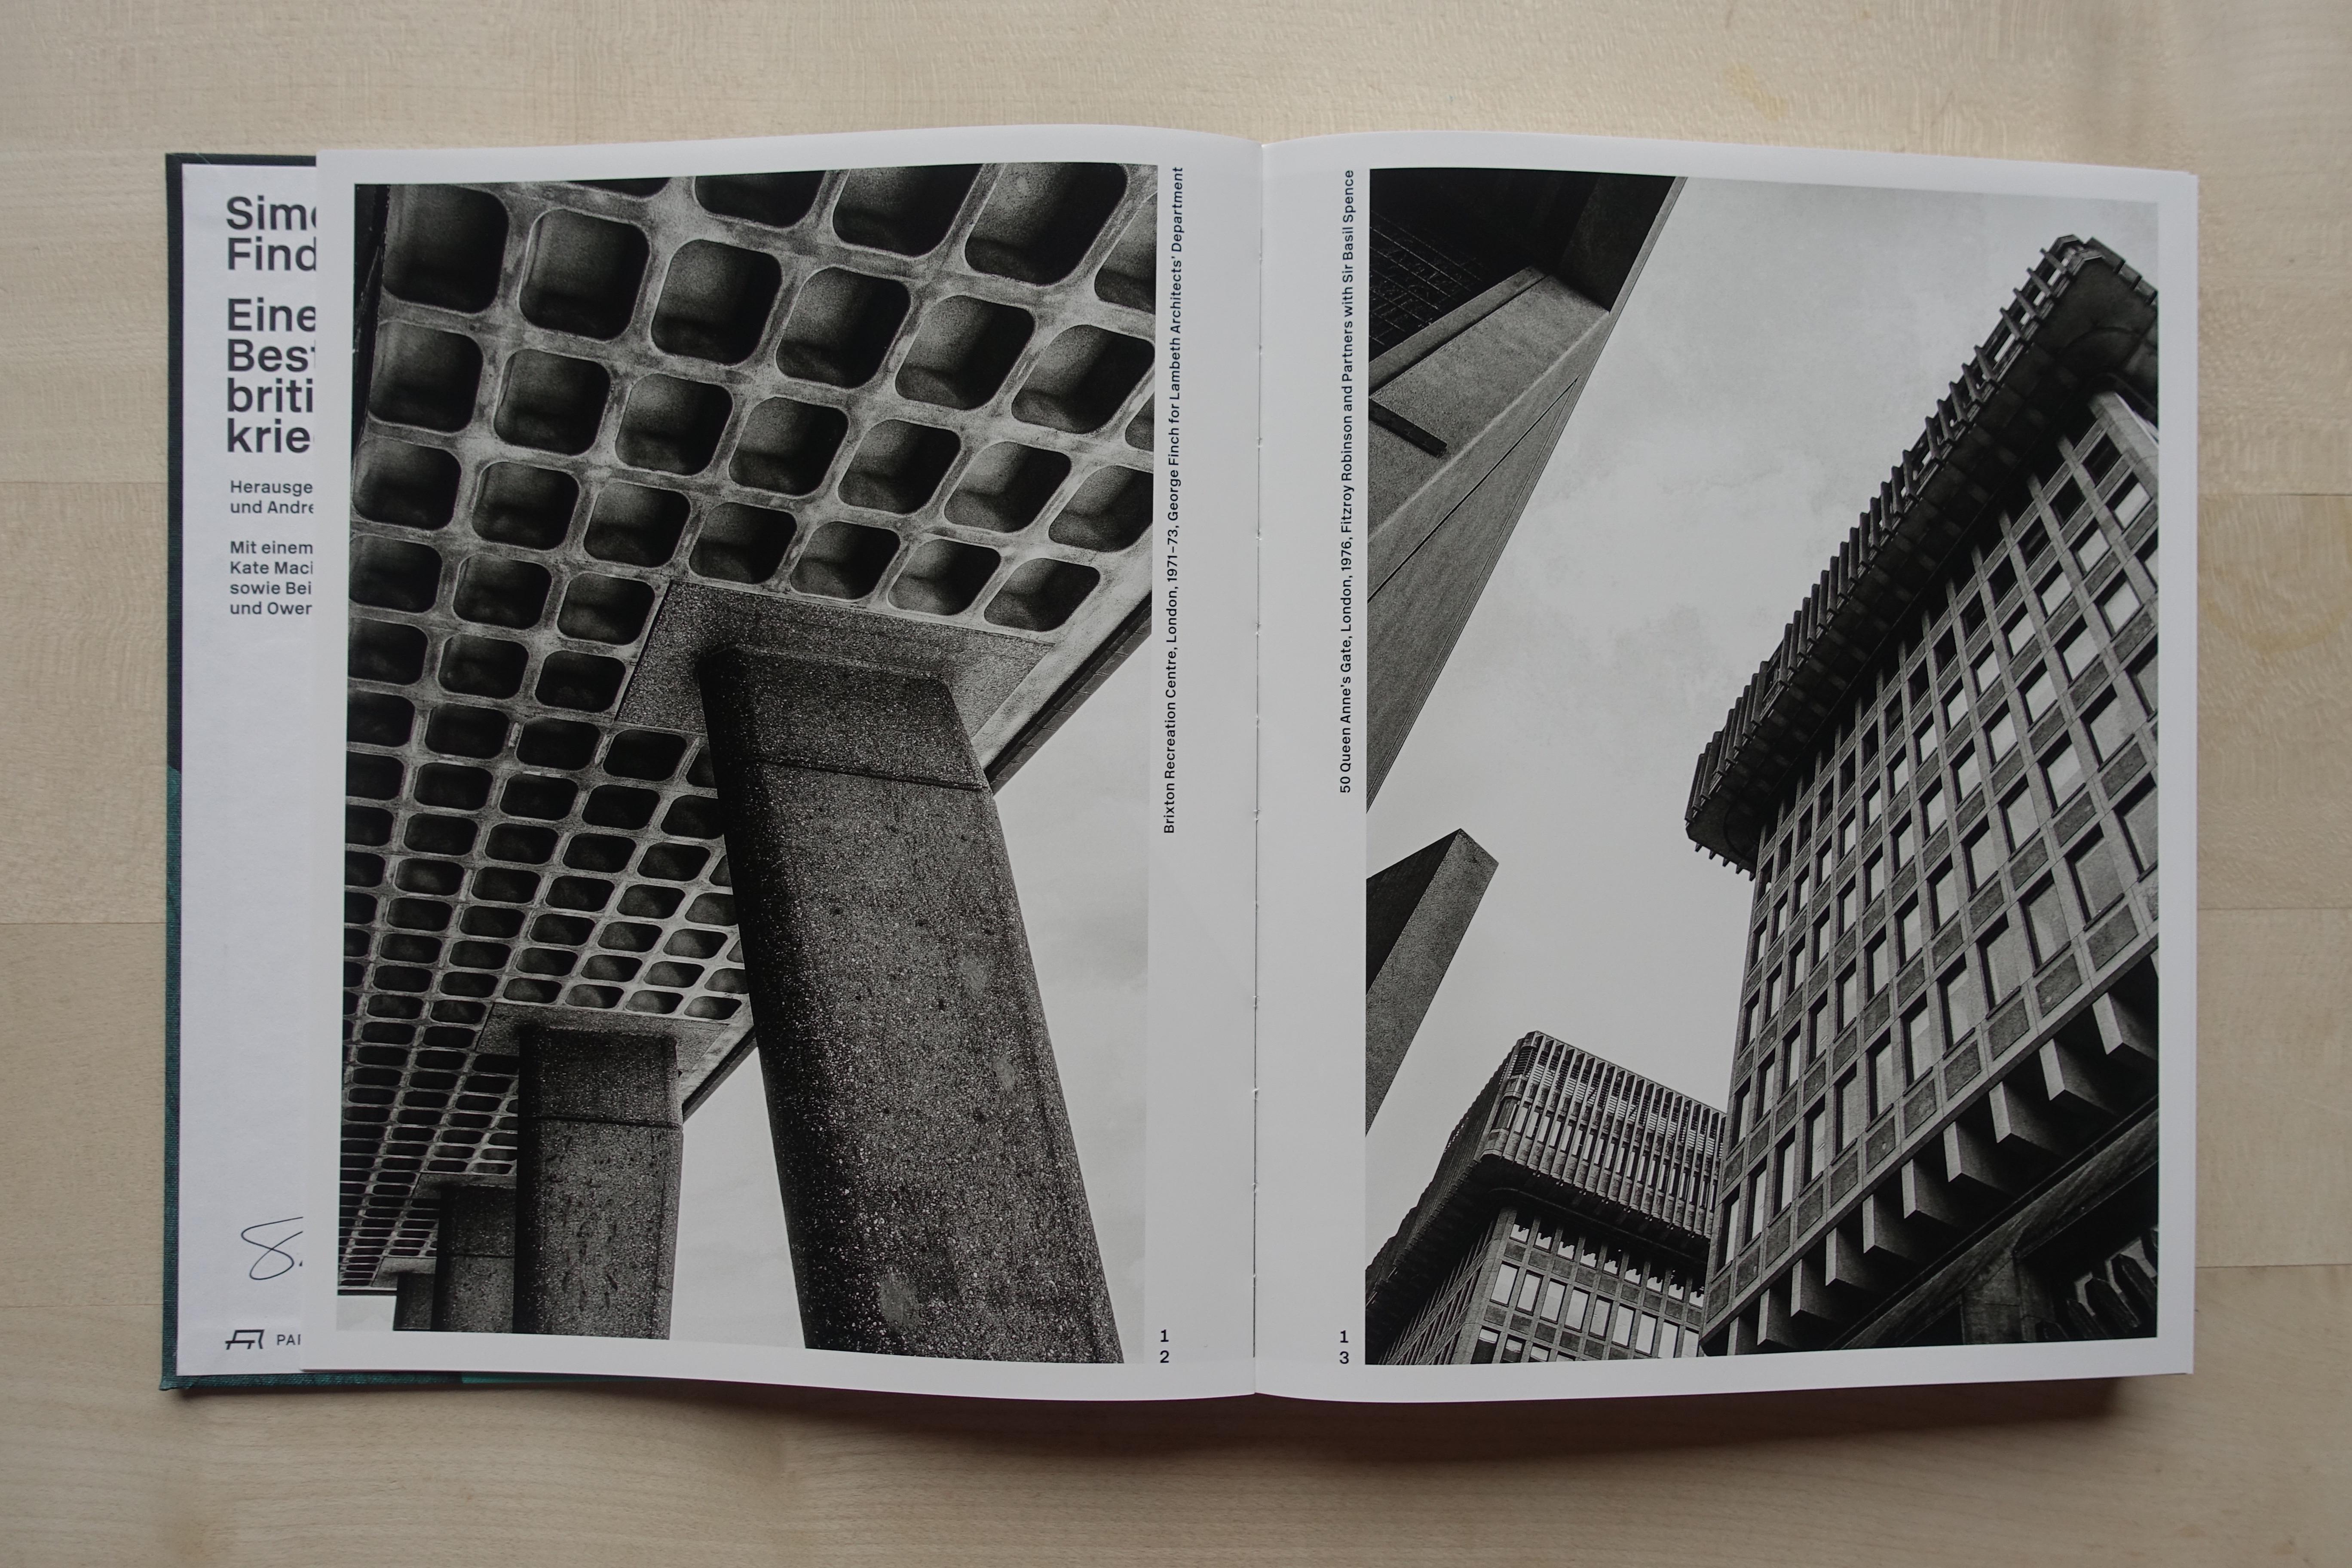 Katalog Simon Phipps, Bildseite (Foto: Gerold Kunz)